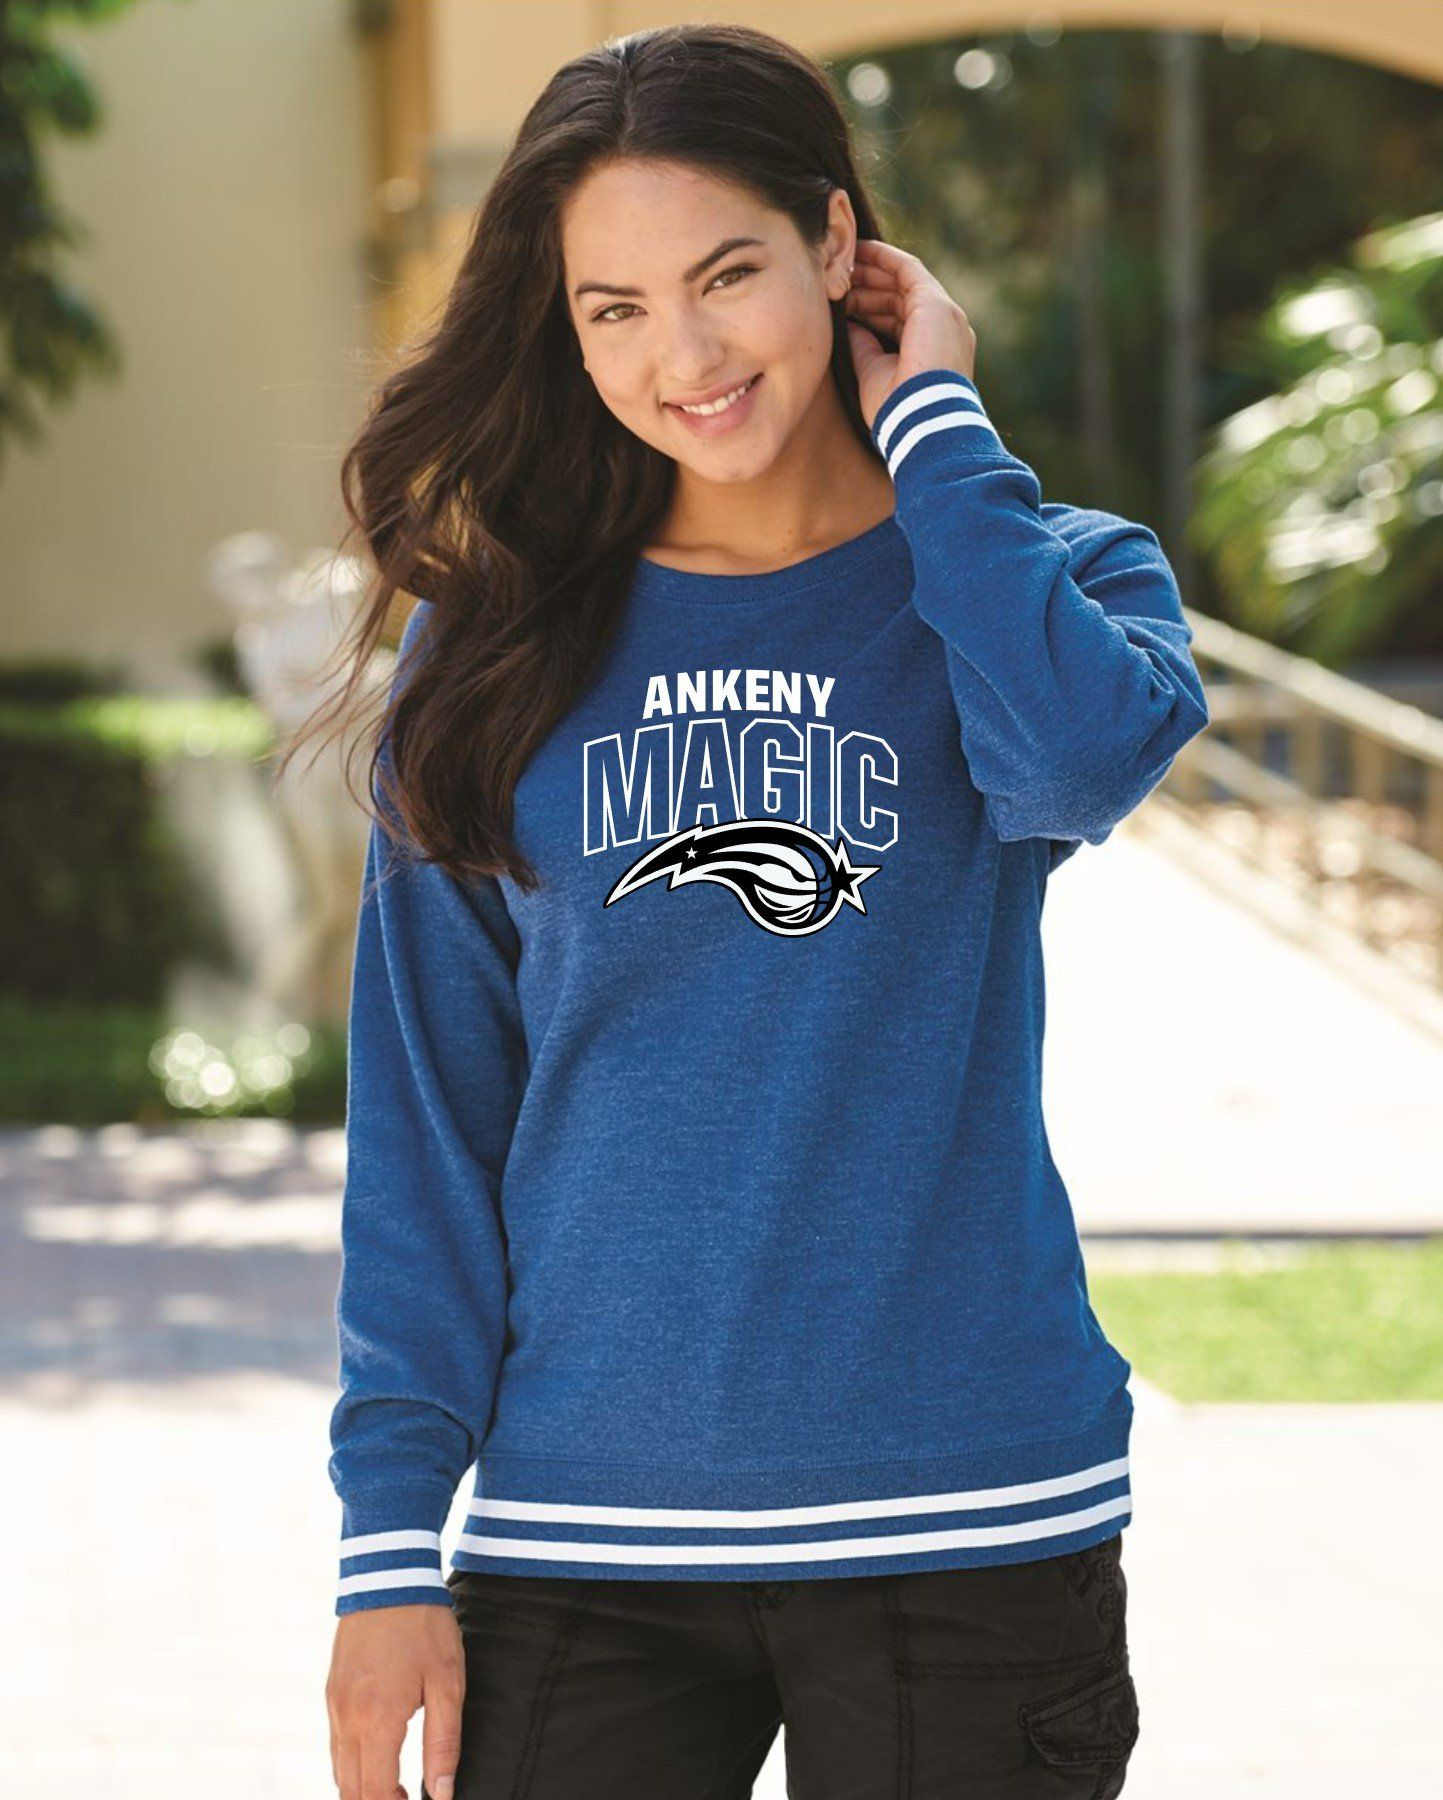 Adult - Ladies Relay Crewneck Sweatshirt - Ankeny Magic - 2XL / ROYAL